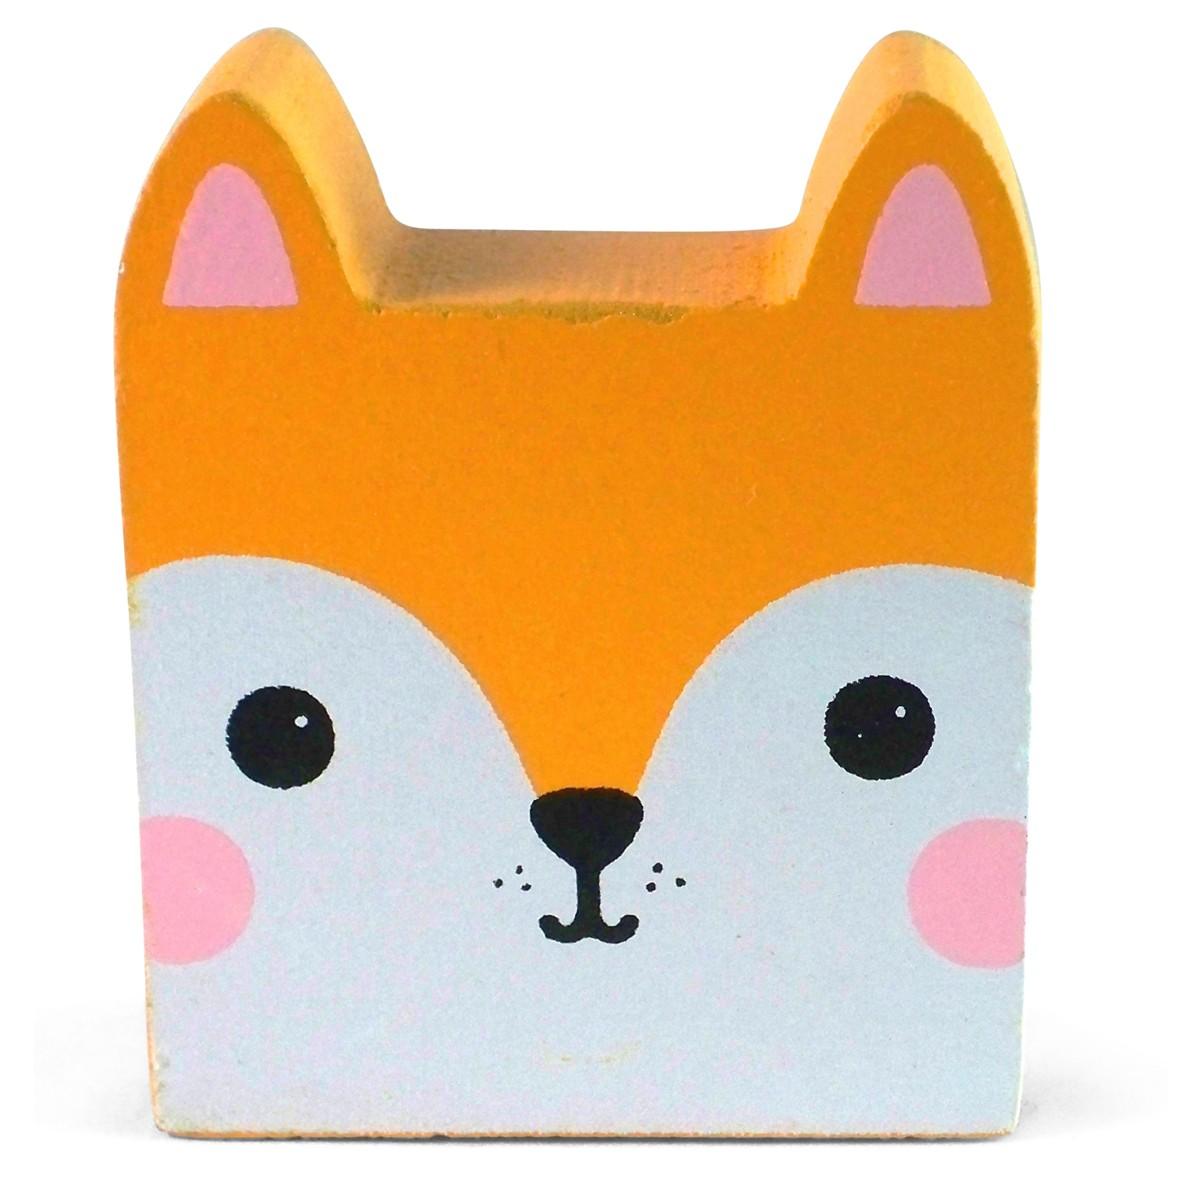 bouton de meuble renard hiro kawa chambre d enfant 3 99 ss31. Black Bedroom Furniture Sets. Home Design Ideas